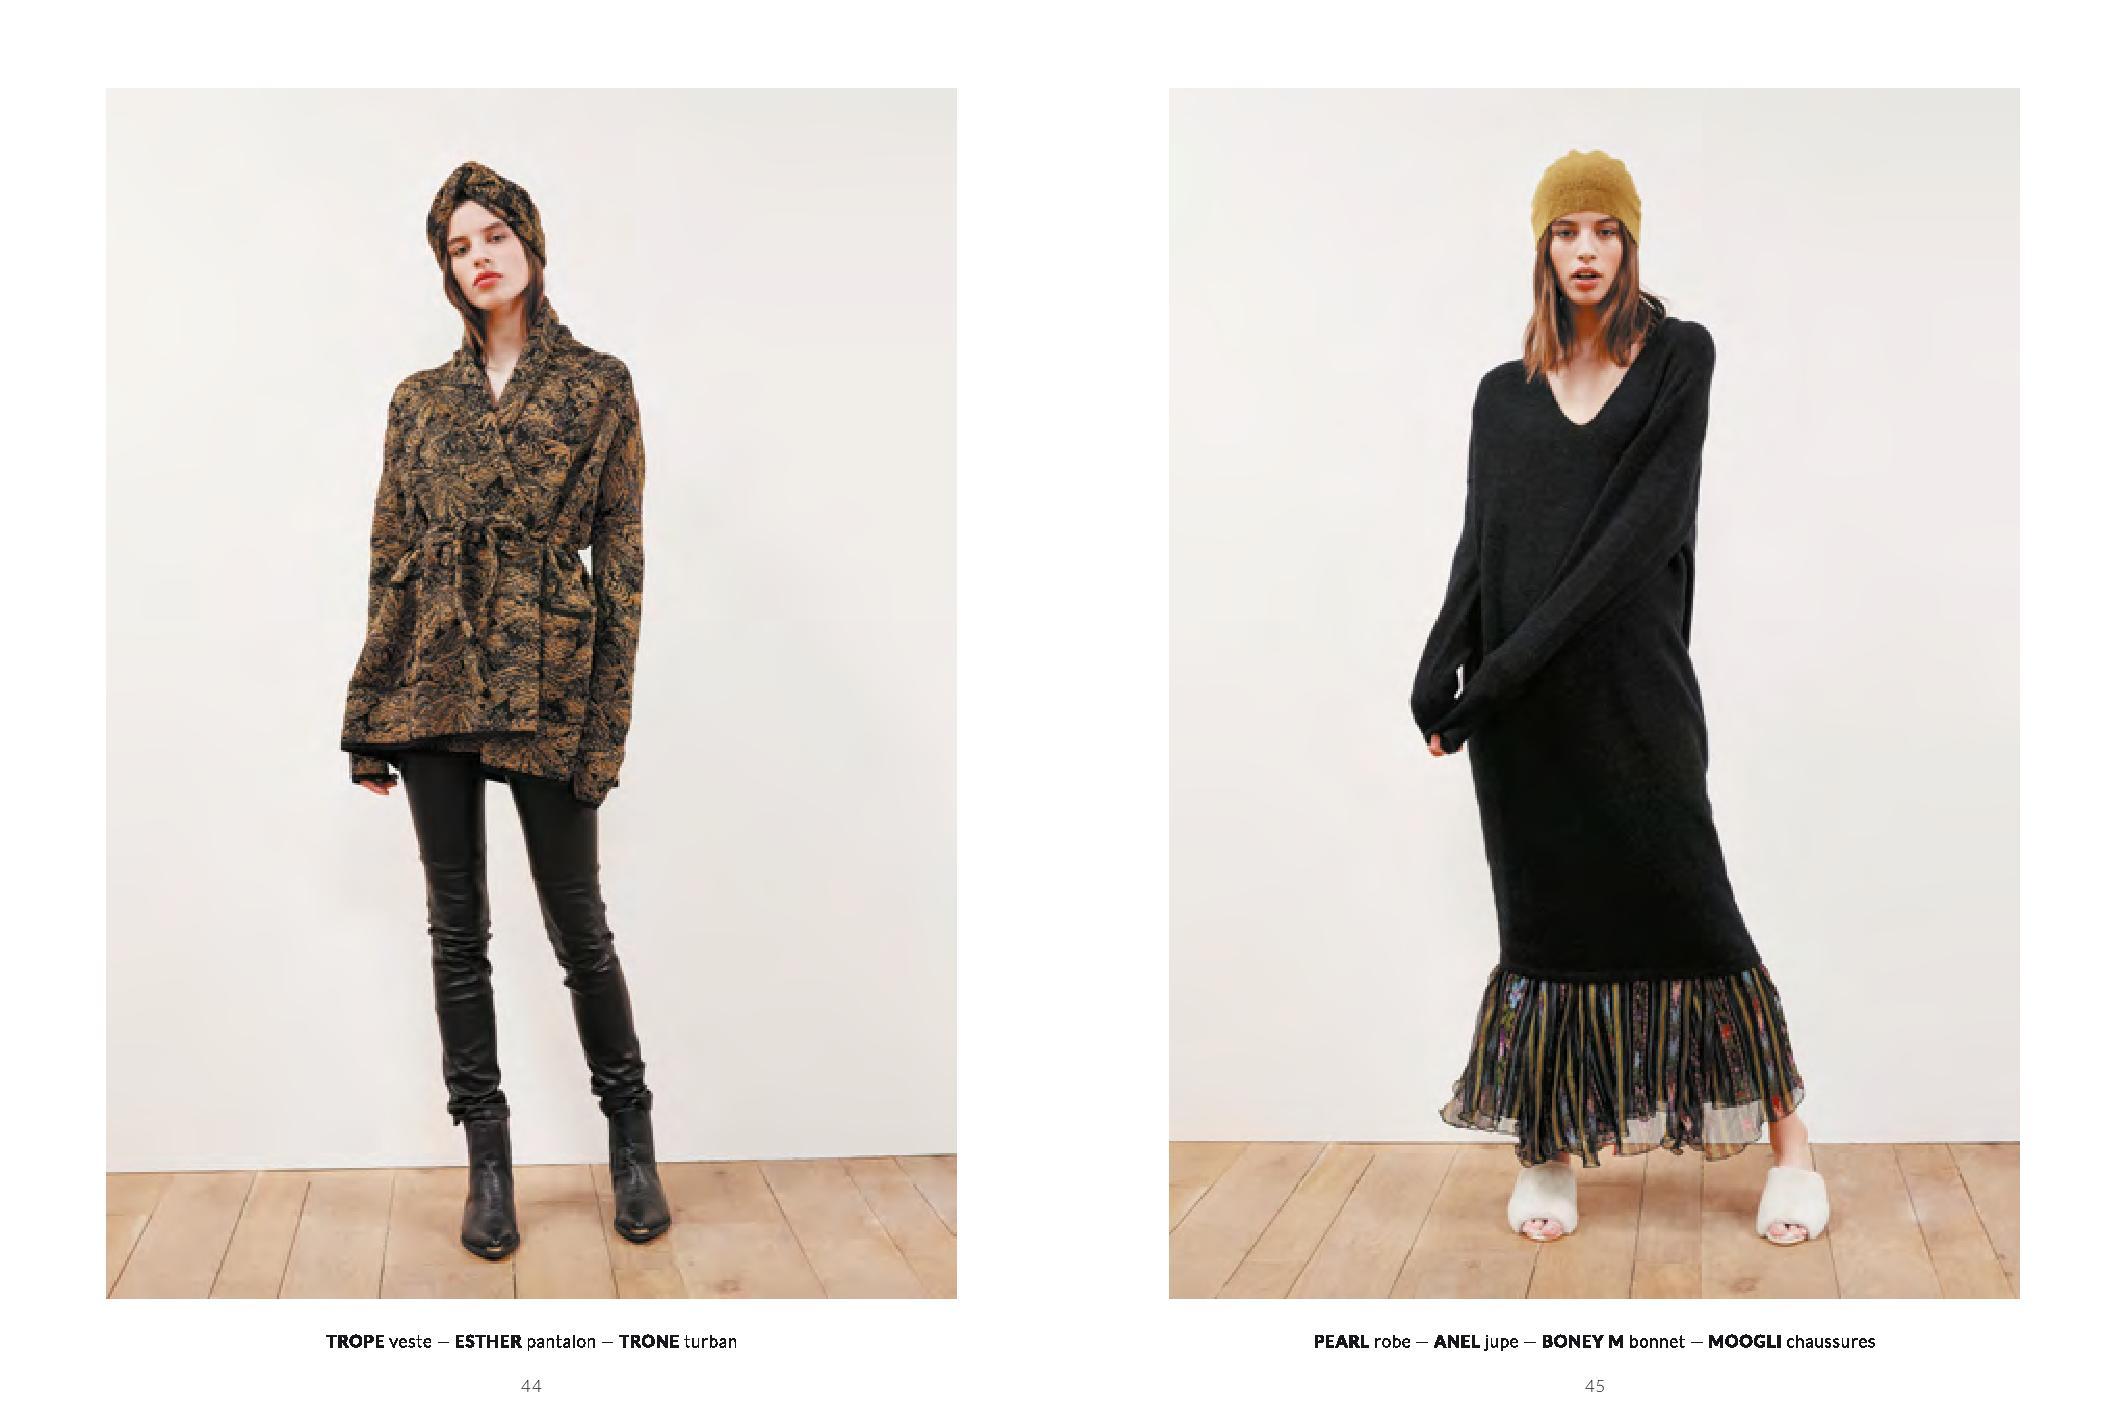 da_md_lookbook_mes_demoiselles_paris_web_dresscode-page-025.jpg